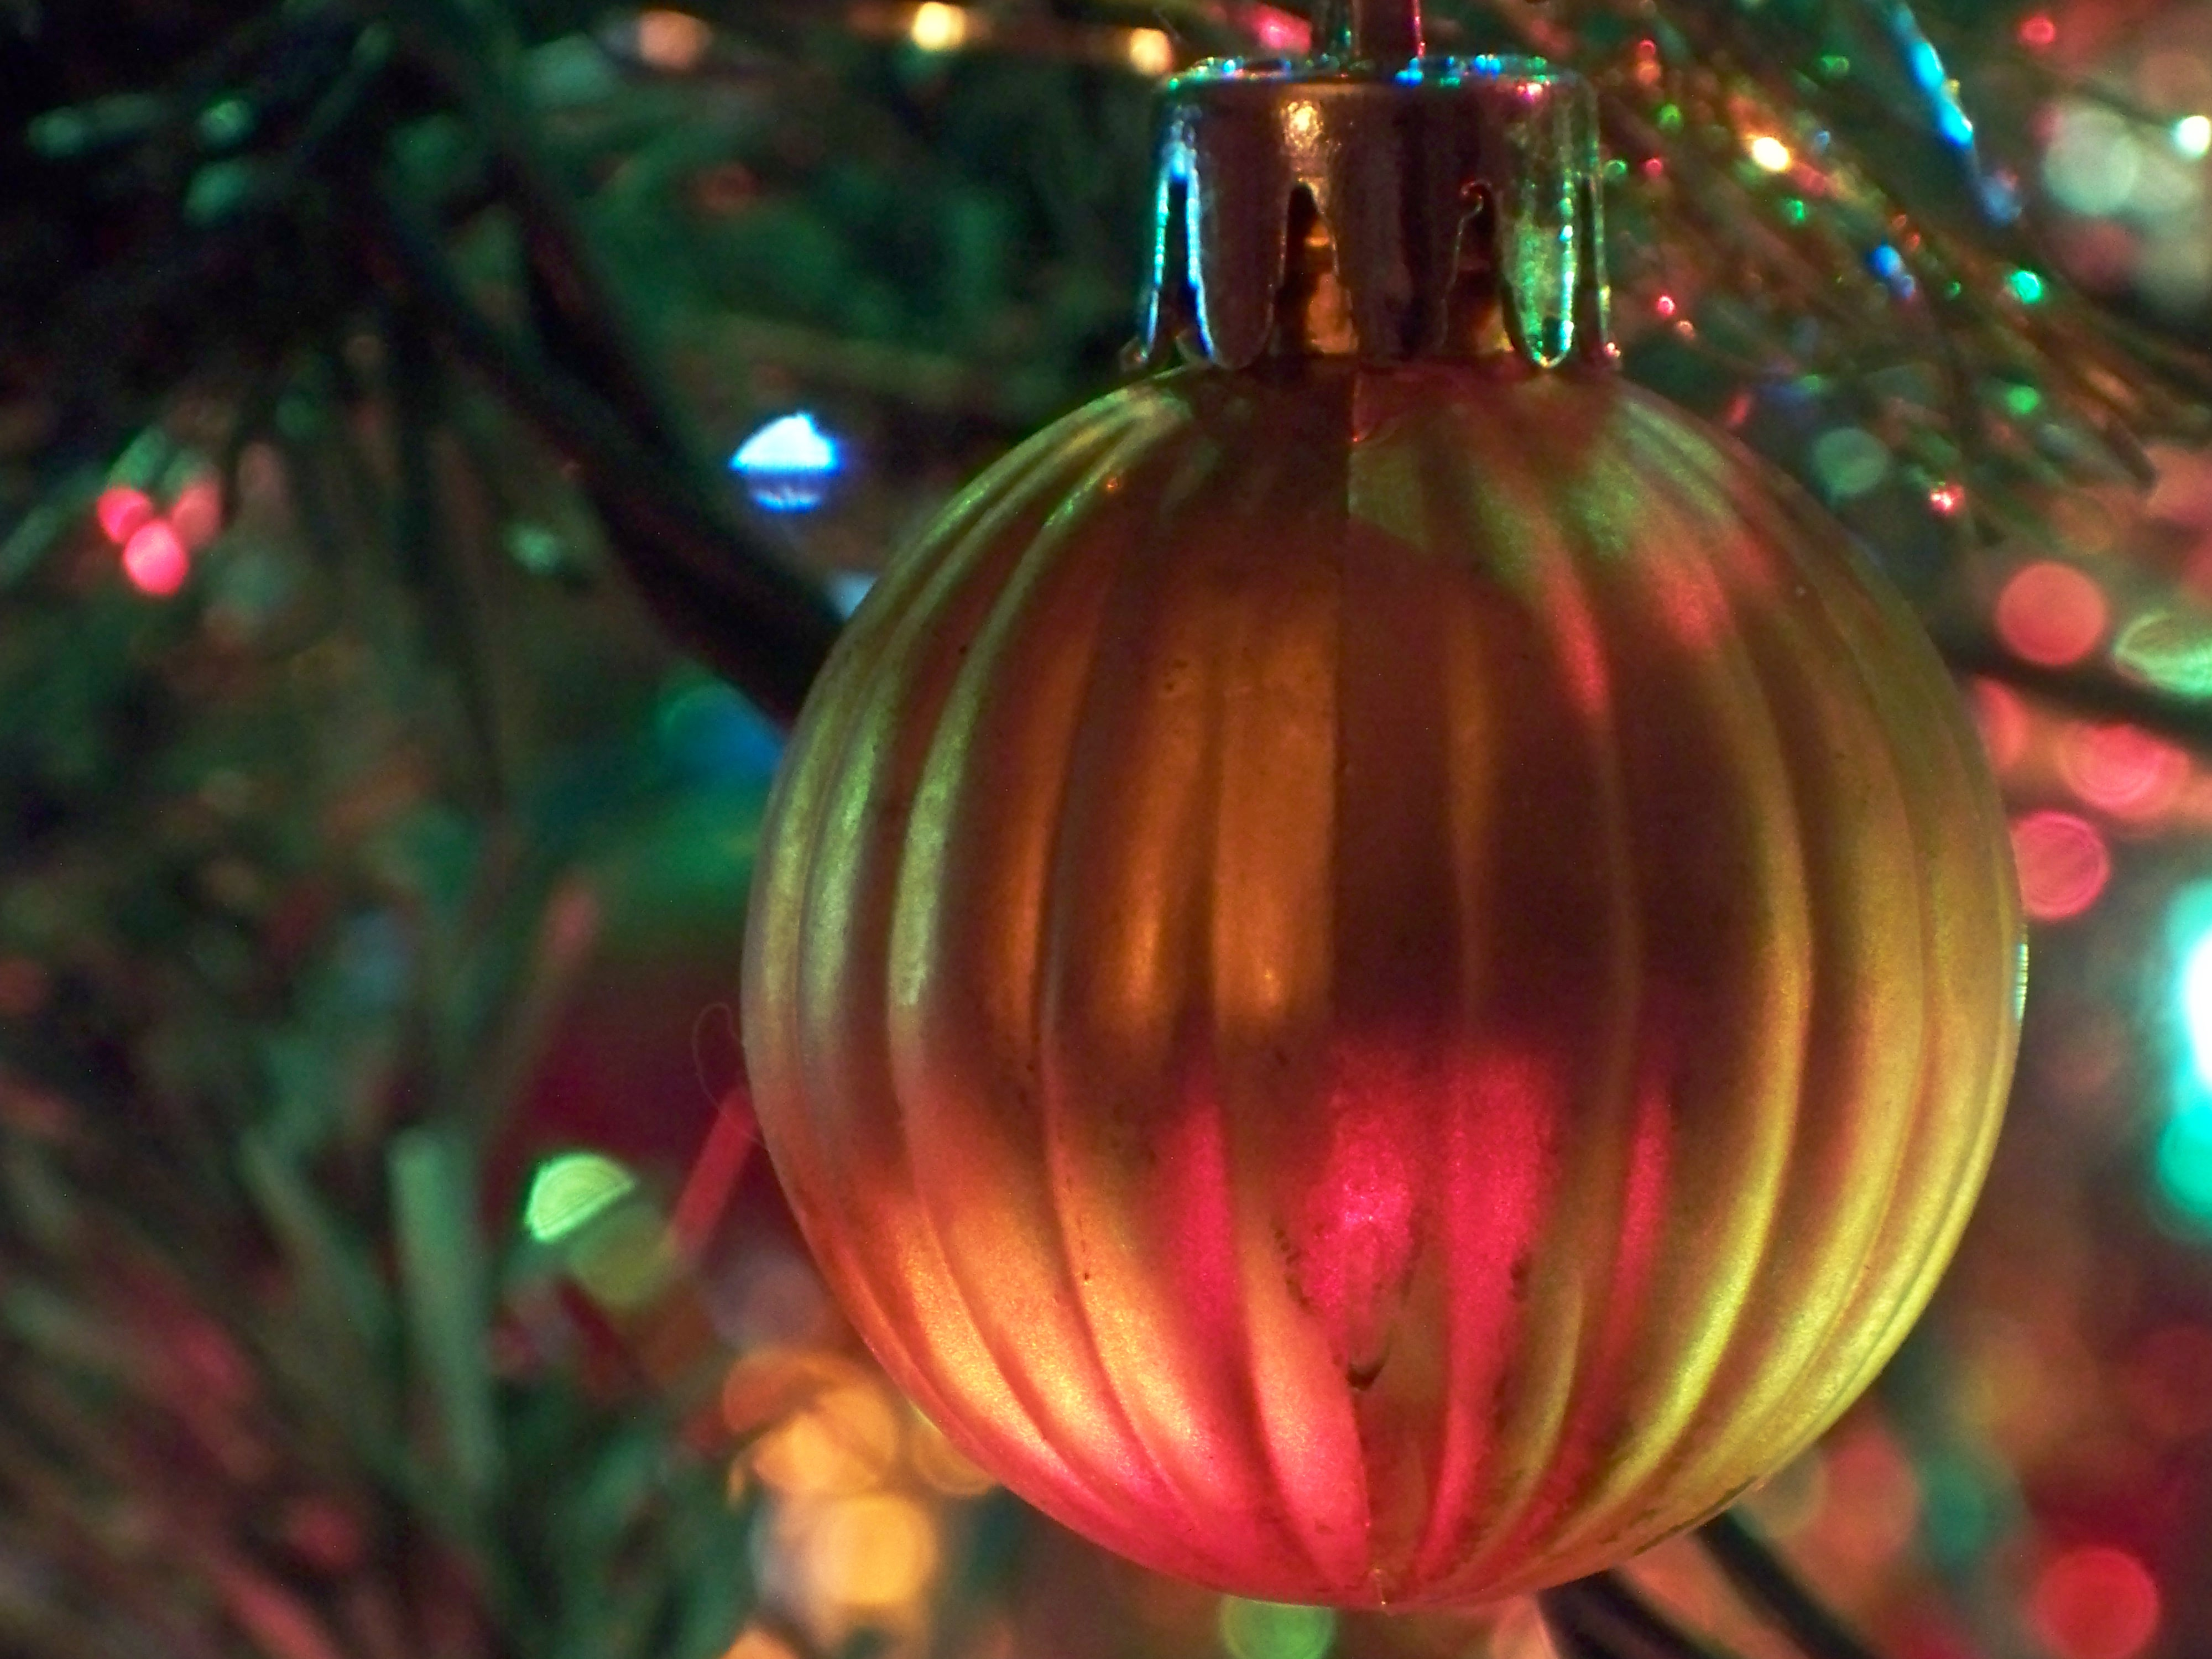 http://upload.wikimedia.org/wikipedia/commons/b/bb/Christmas.JPG